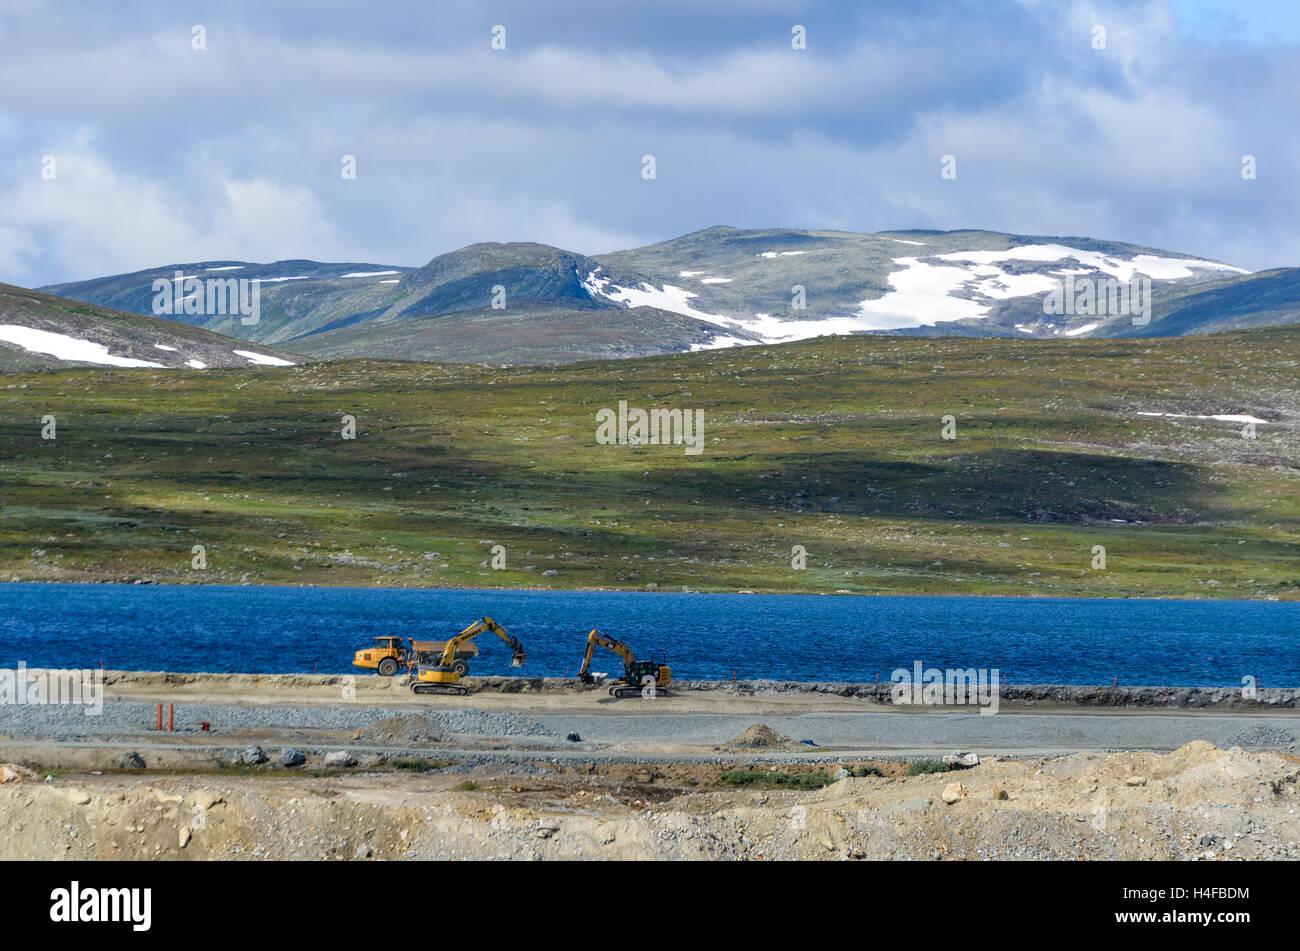 Industria mineraria e le operazioni di ingegneria vicino a Stekenjokk montagne Vildmarksvägen, Svezia Immagini Stock